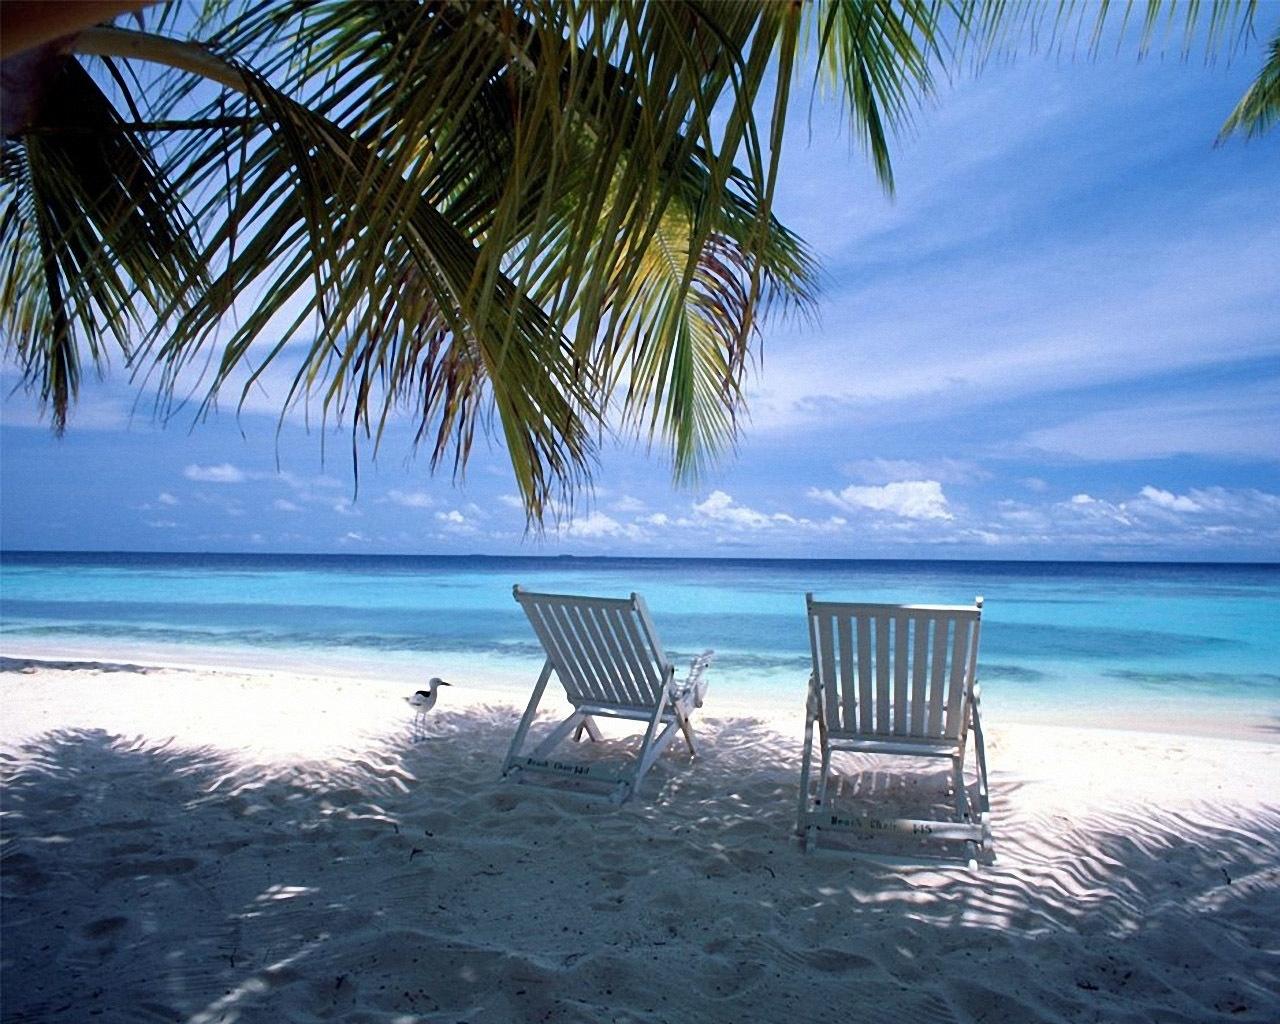 10 latest free caribbean beach wallpaper full hd 1080p for pc desktop